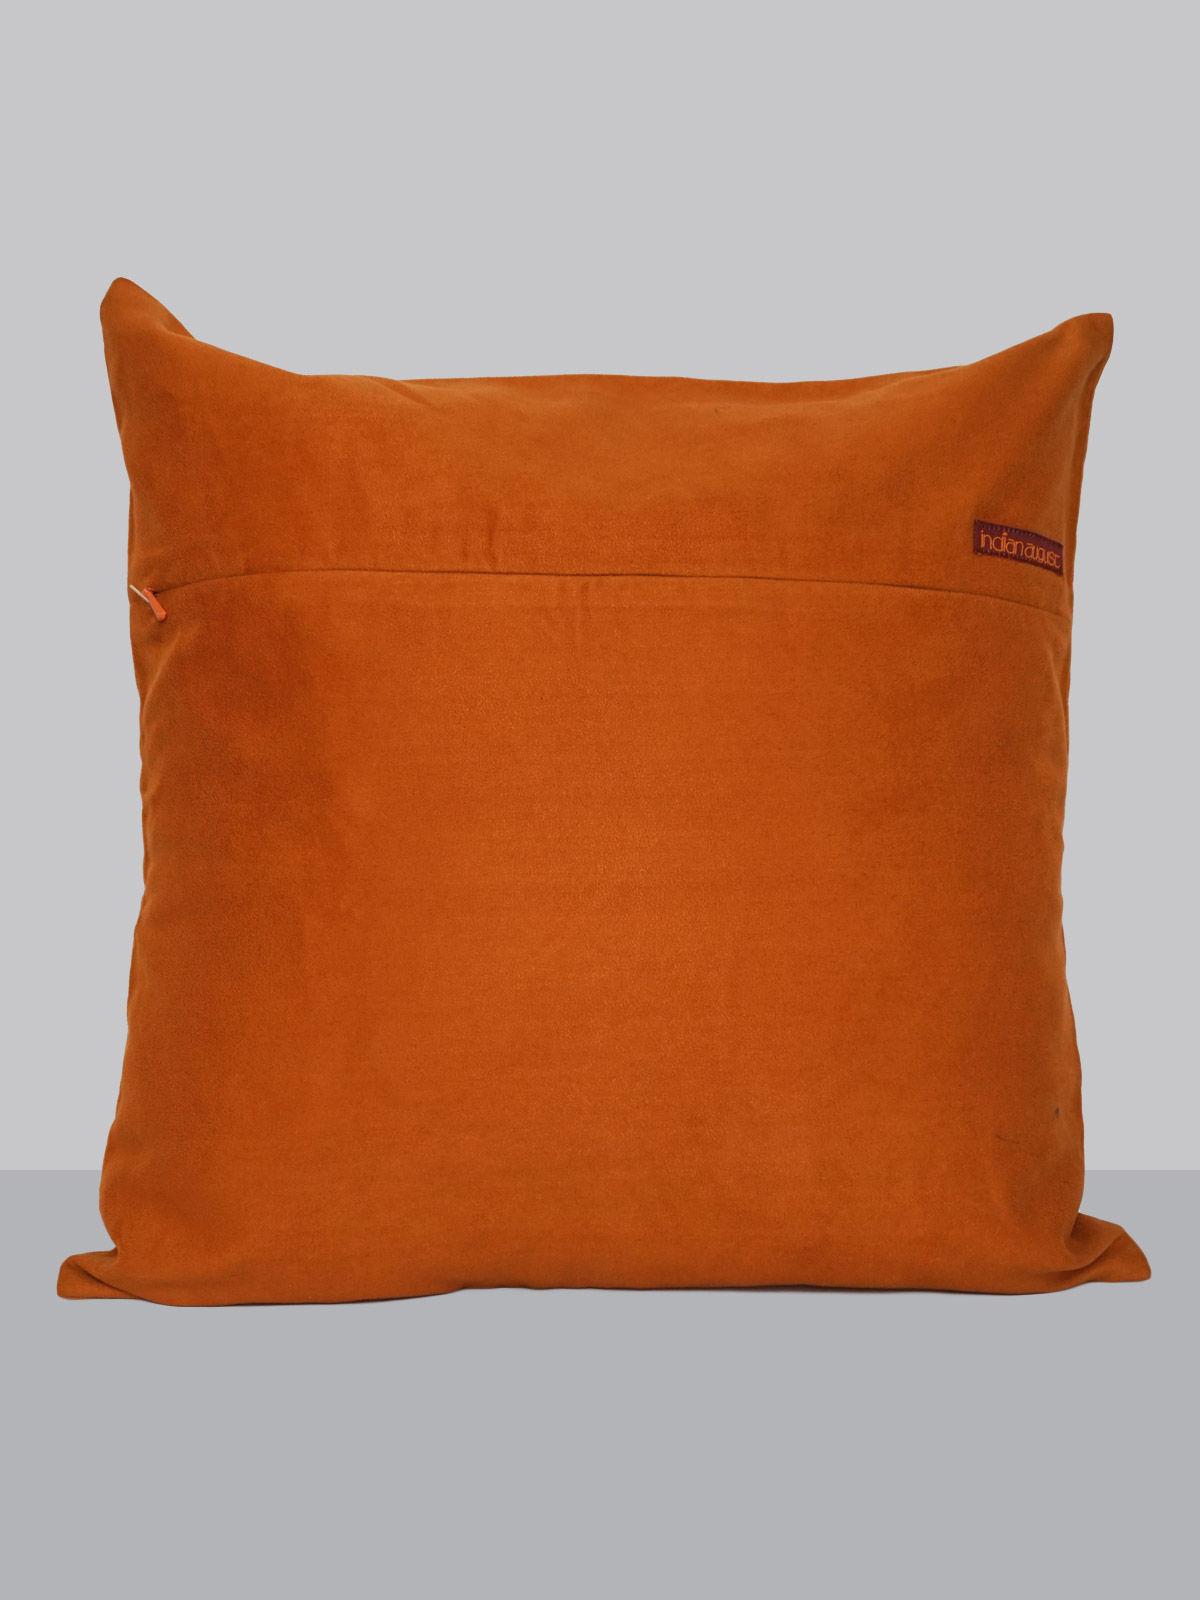 Orange suede leaf pattern felt patchwork cushion cover